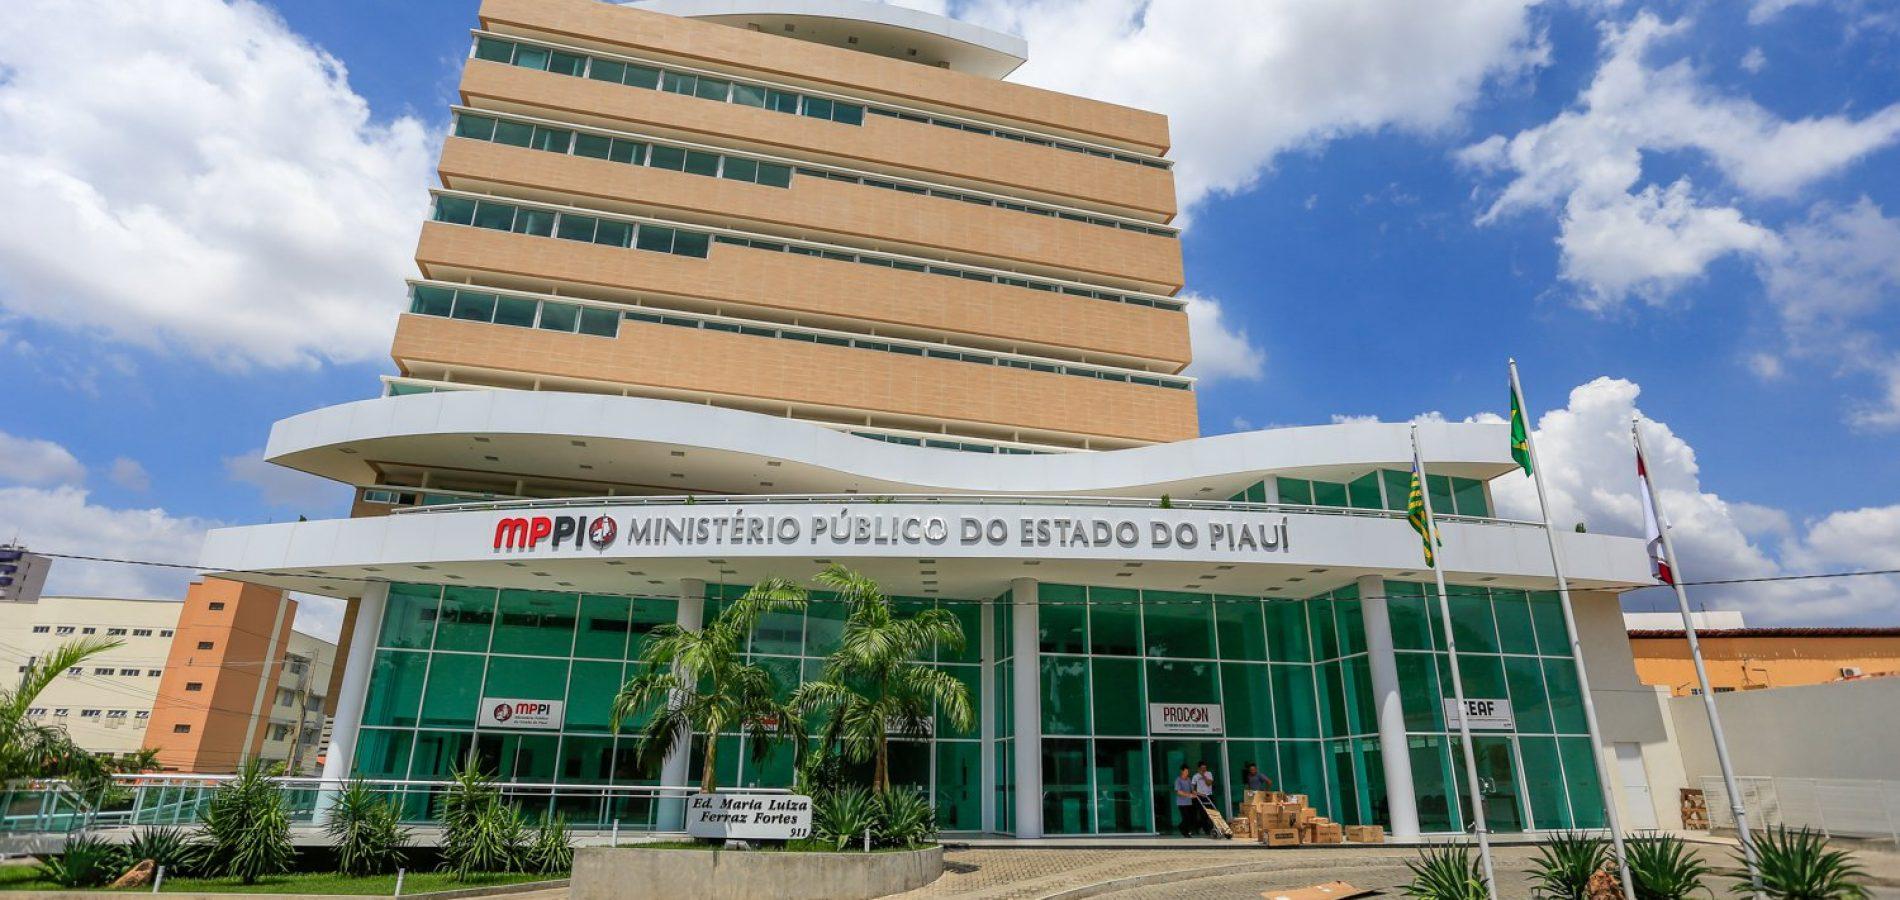 Promotor investiga denúncia contra ex-prefeito de cidade do piauí